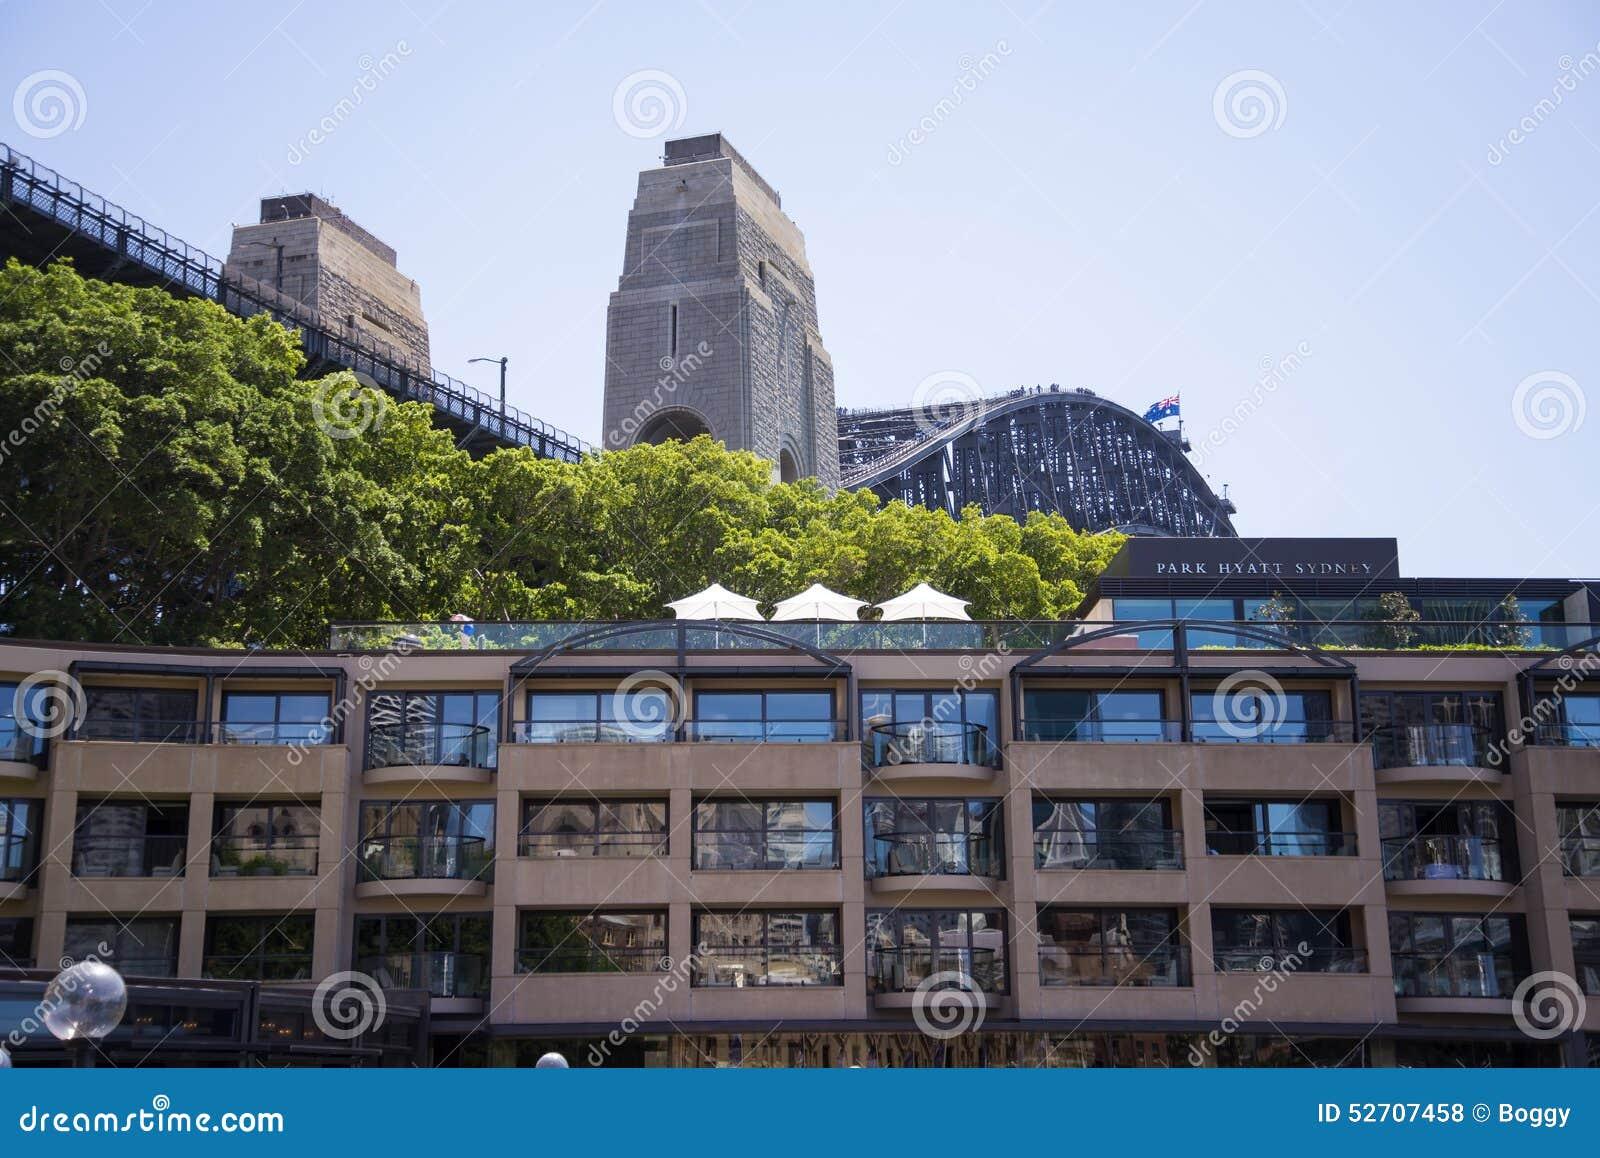 Hotel Park Hyatt Sydney Editorial Stock Photo Image Of Skyline